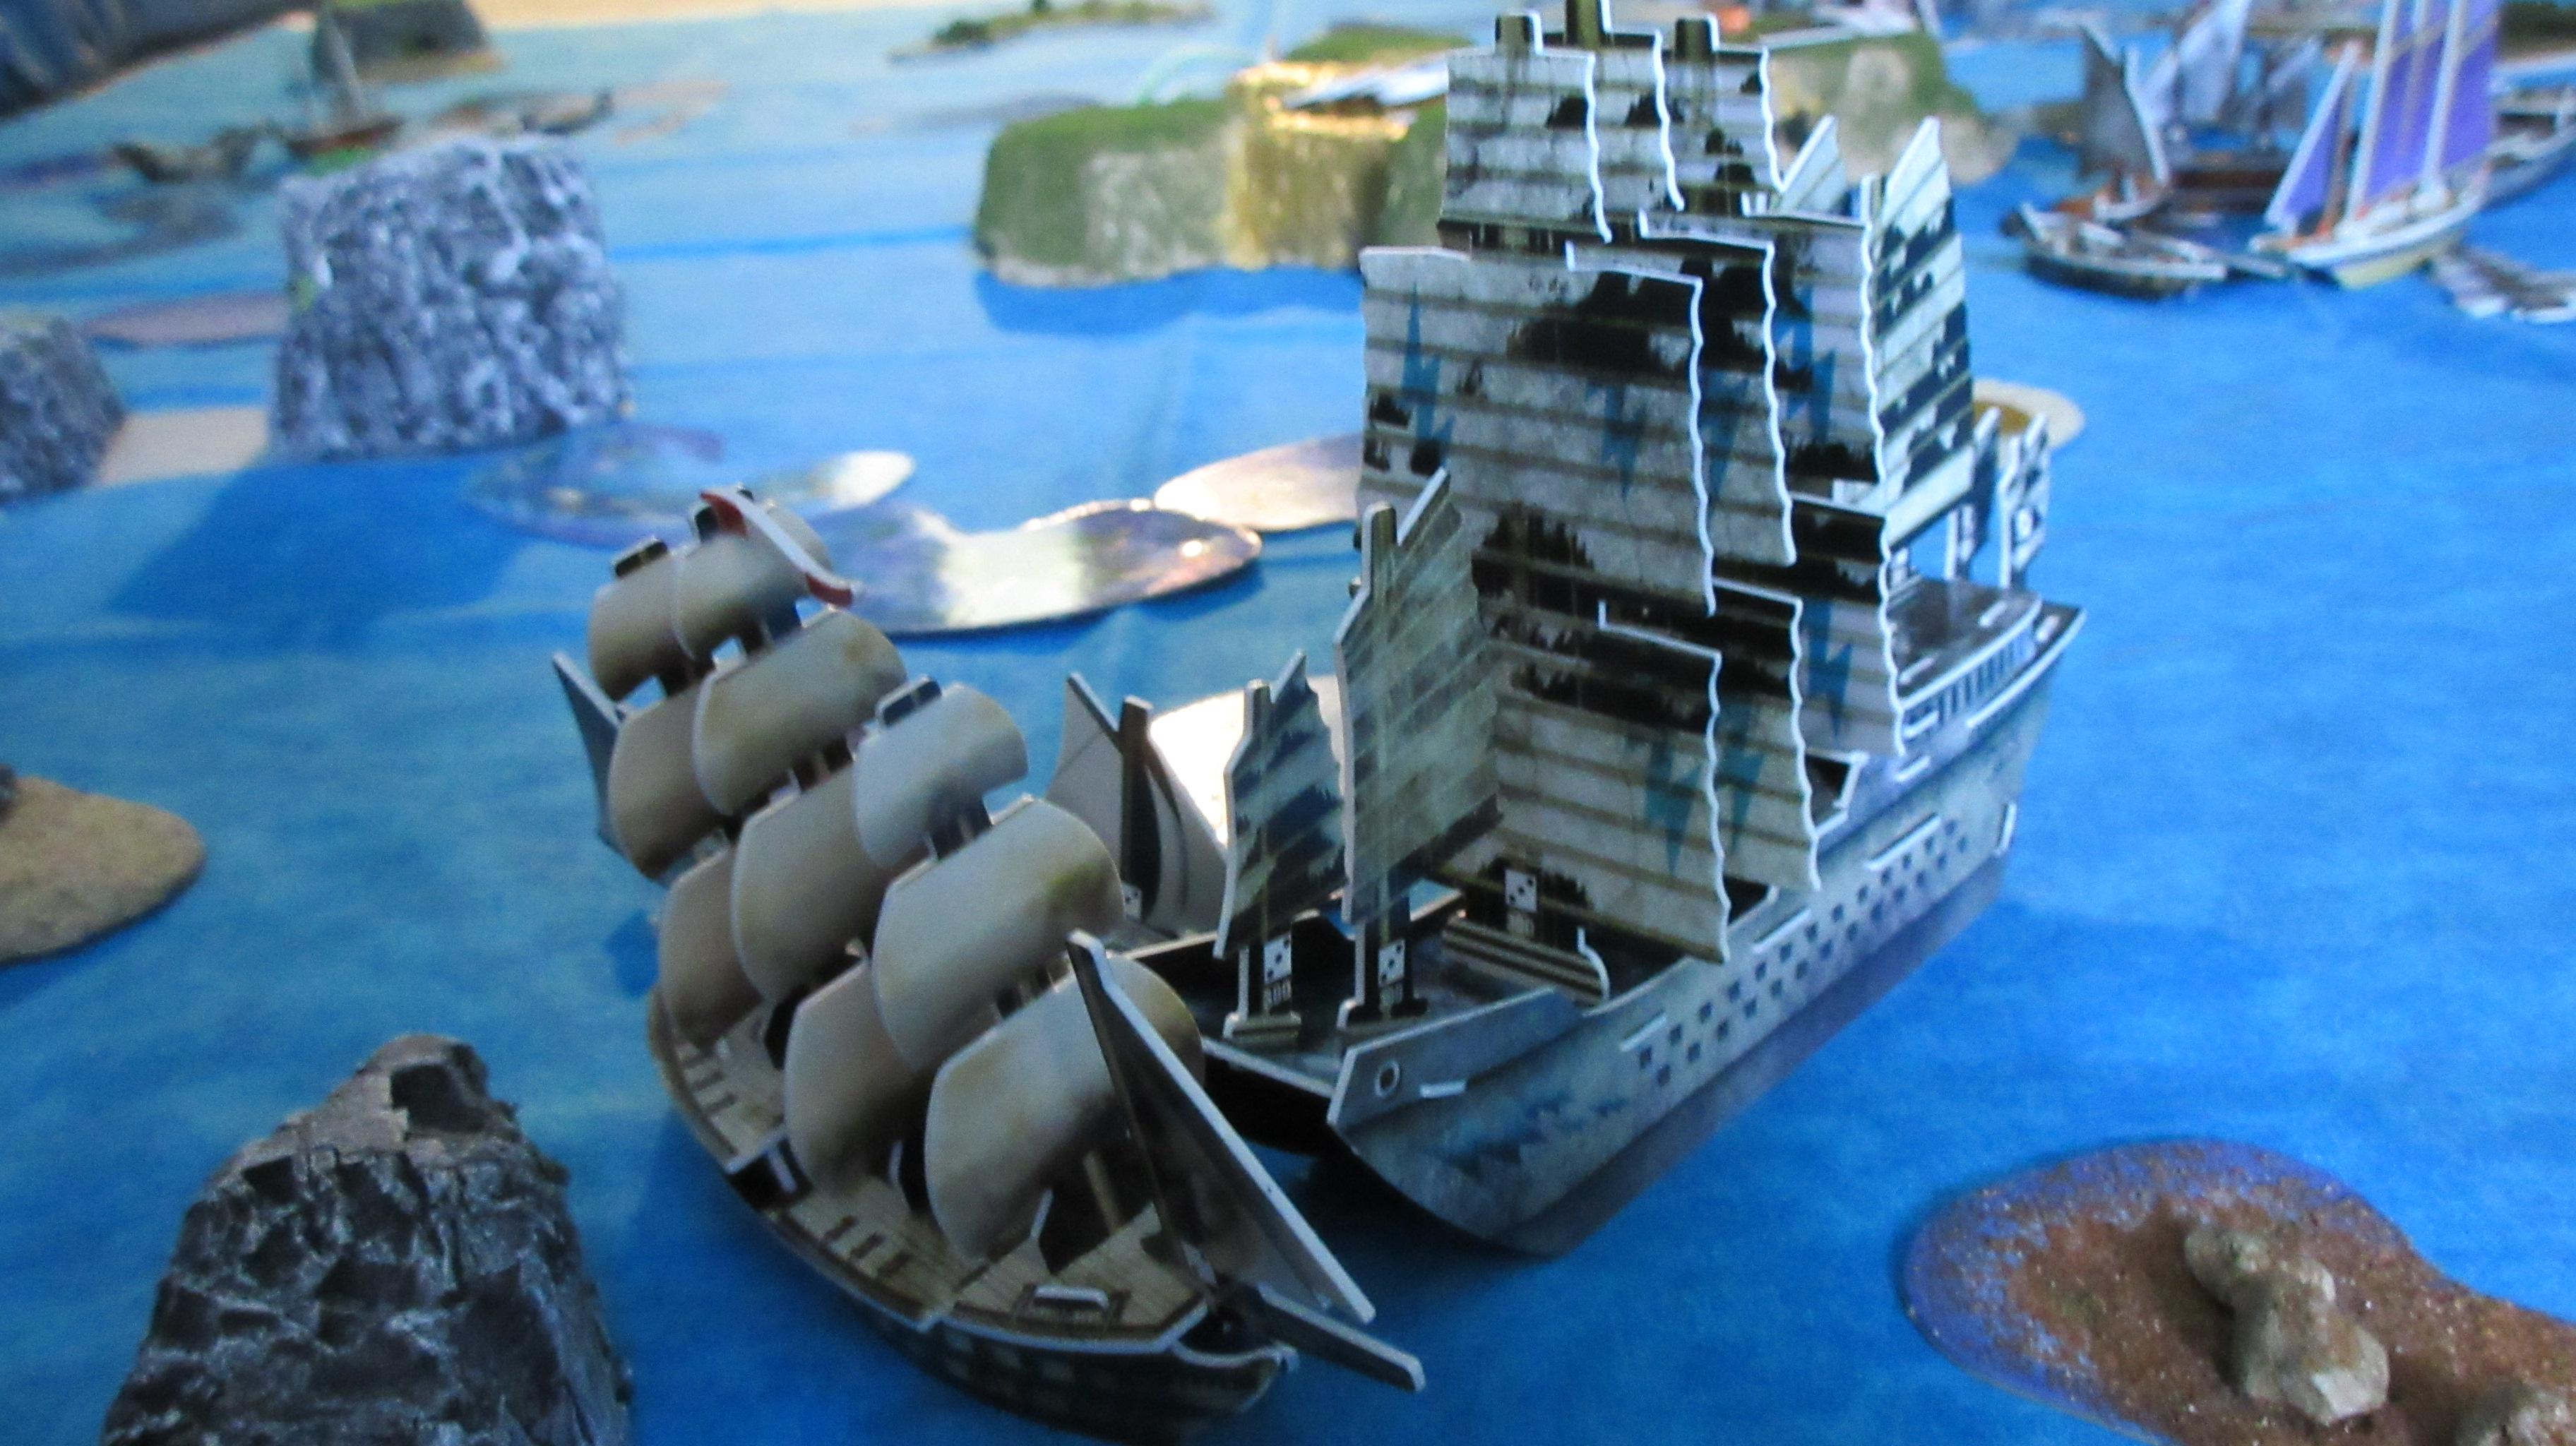 Zeus rams HMS Titan